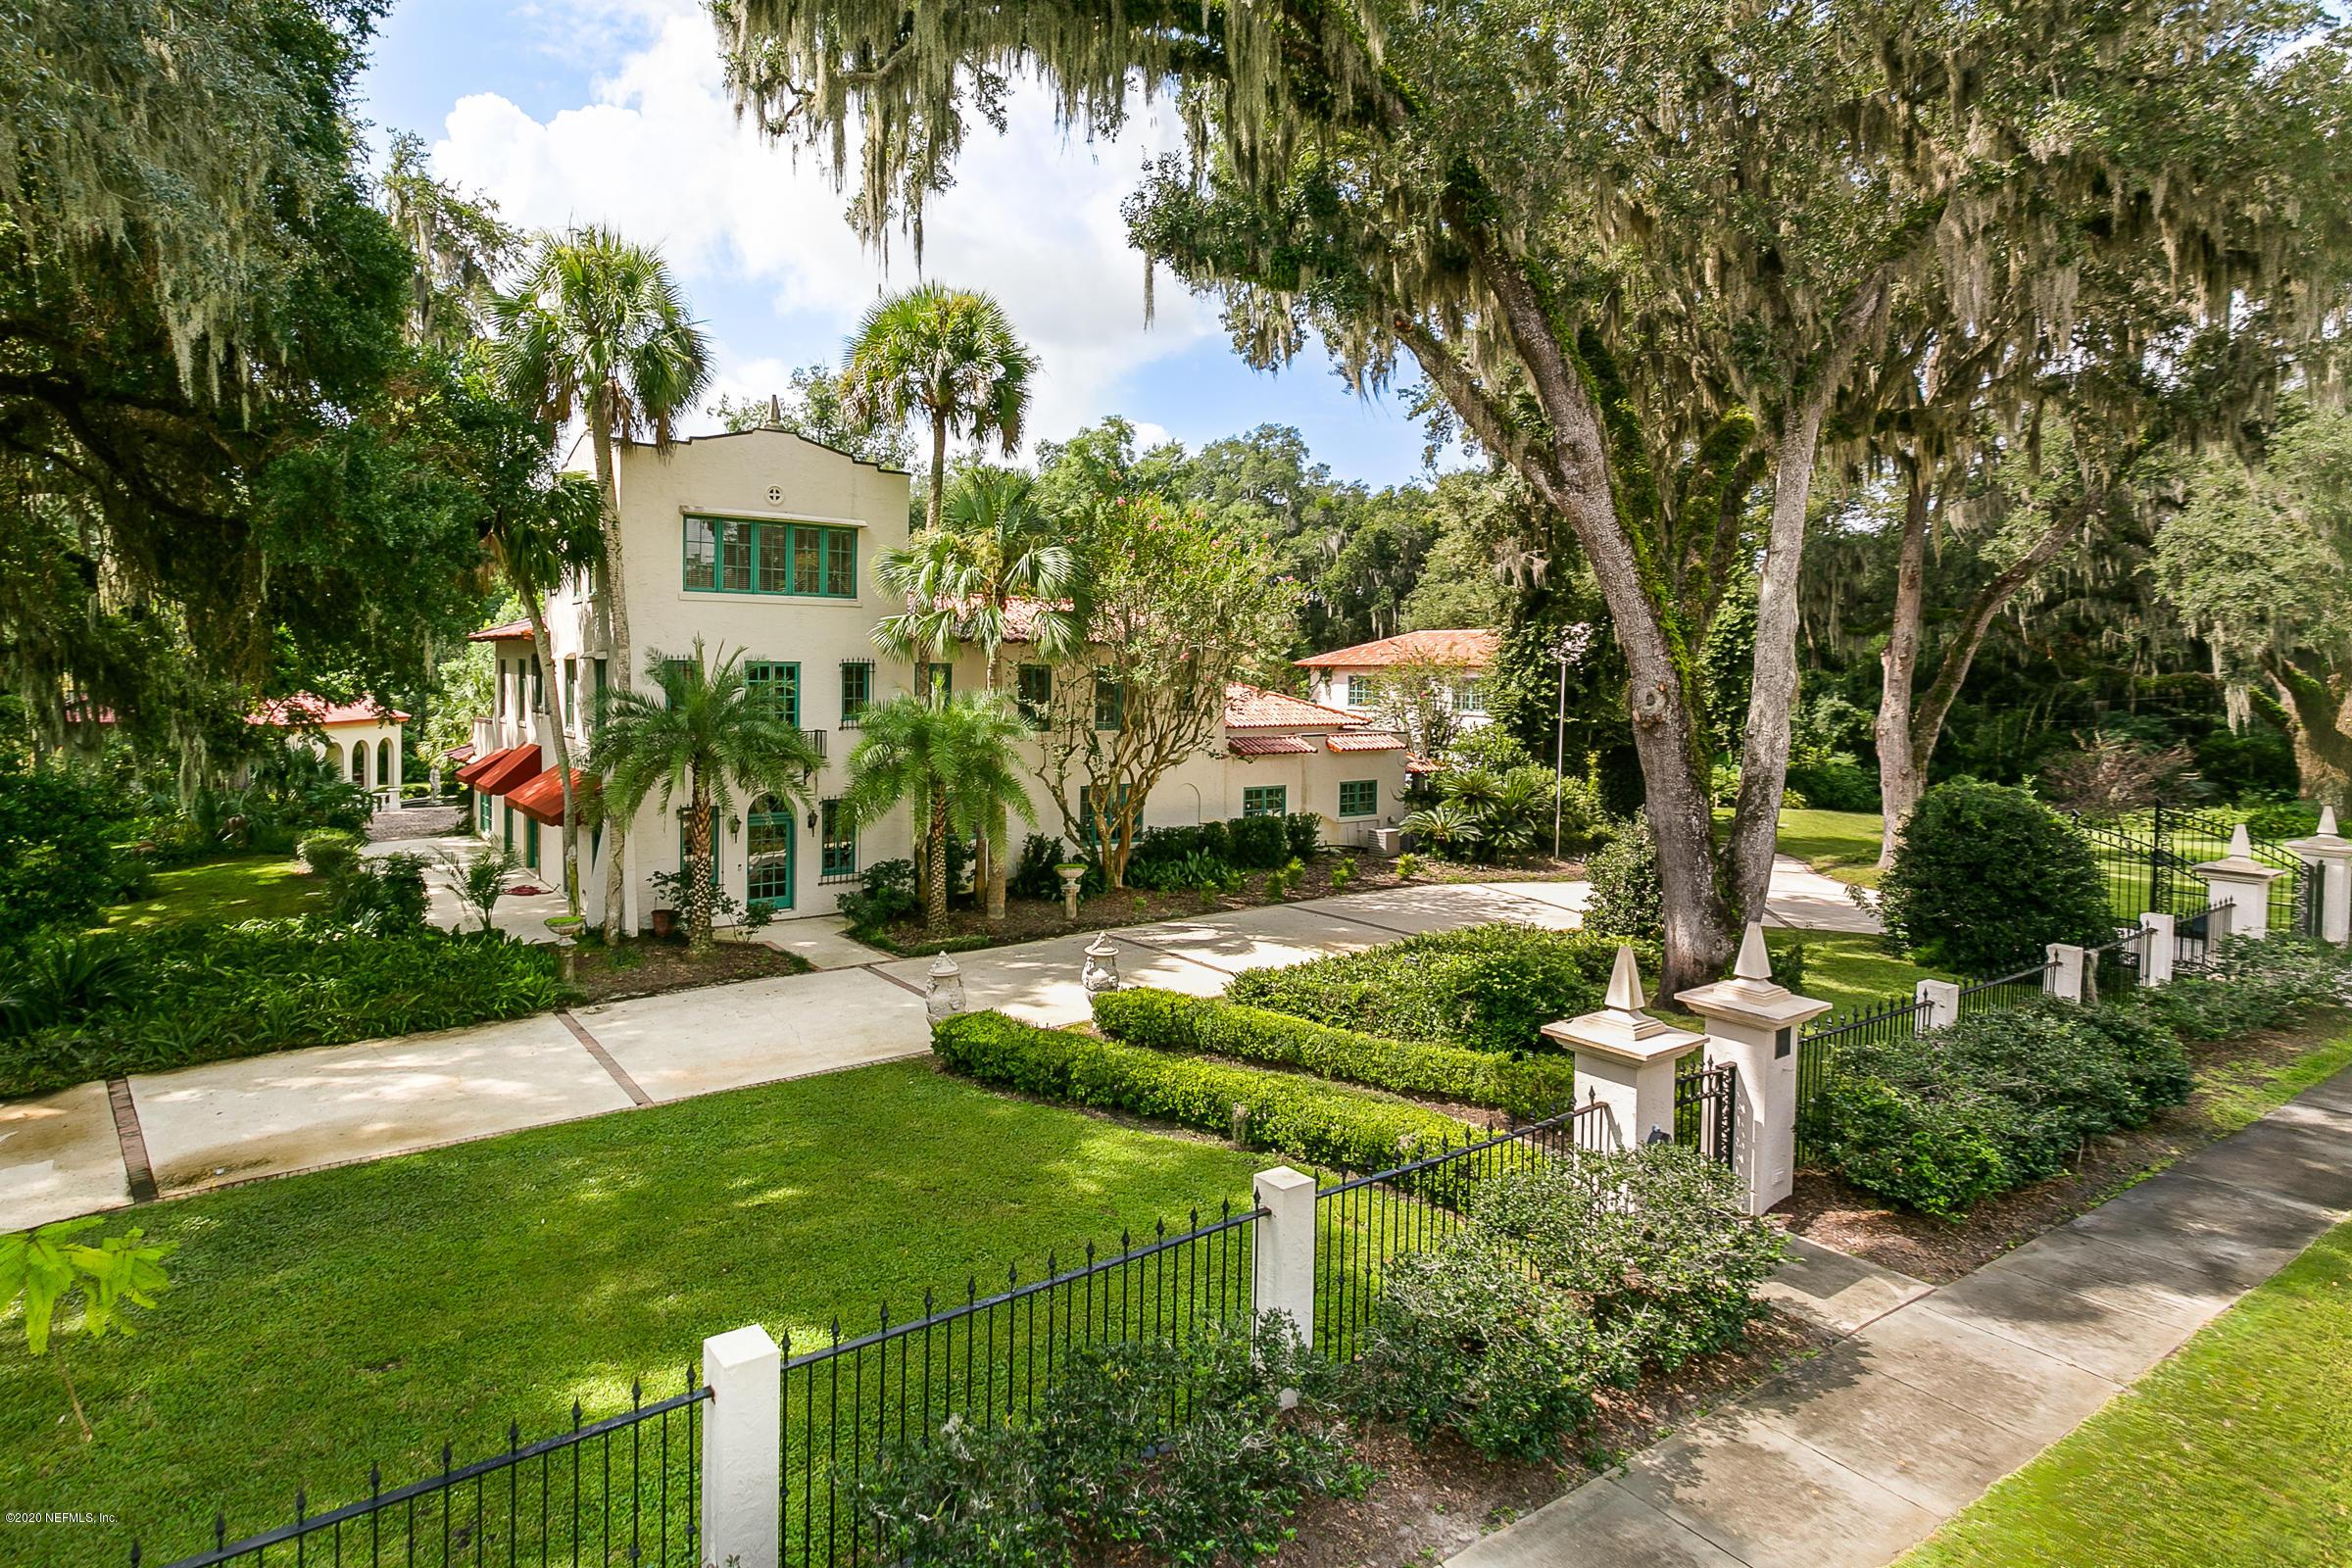 104 MILWAUKEE, ORANGE PARK, FLORIDA 32073, 5 Bedrooms Bedrooms, ,5 BathroomsBathrooms,Residential,For sale,MILWAUKEE,1113592